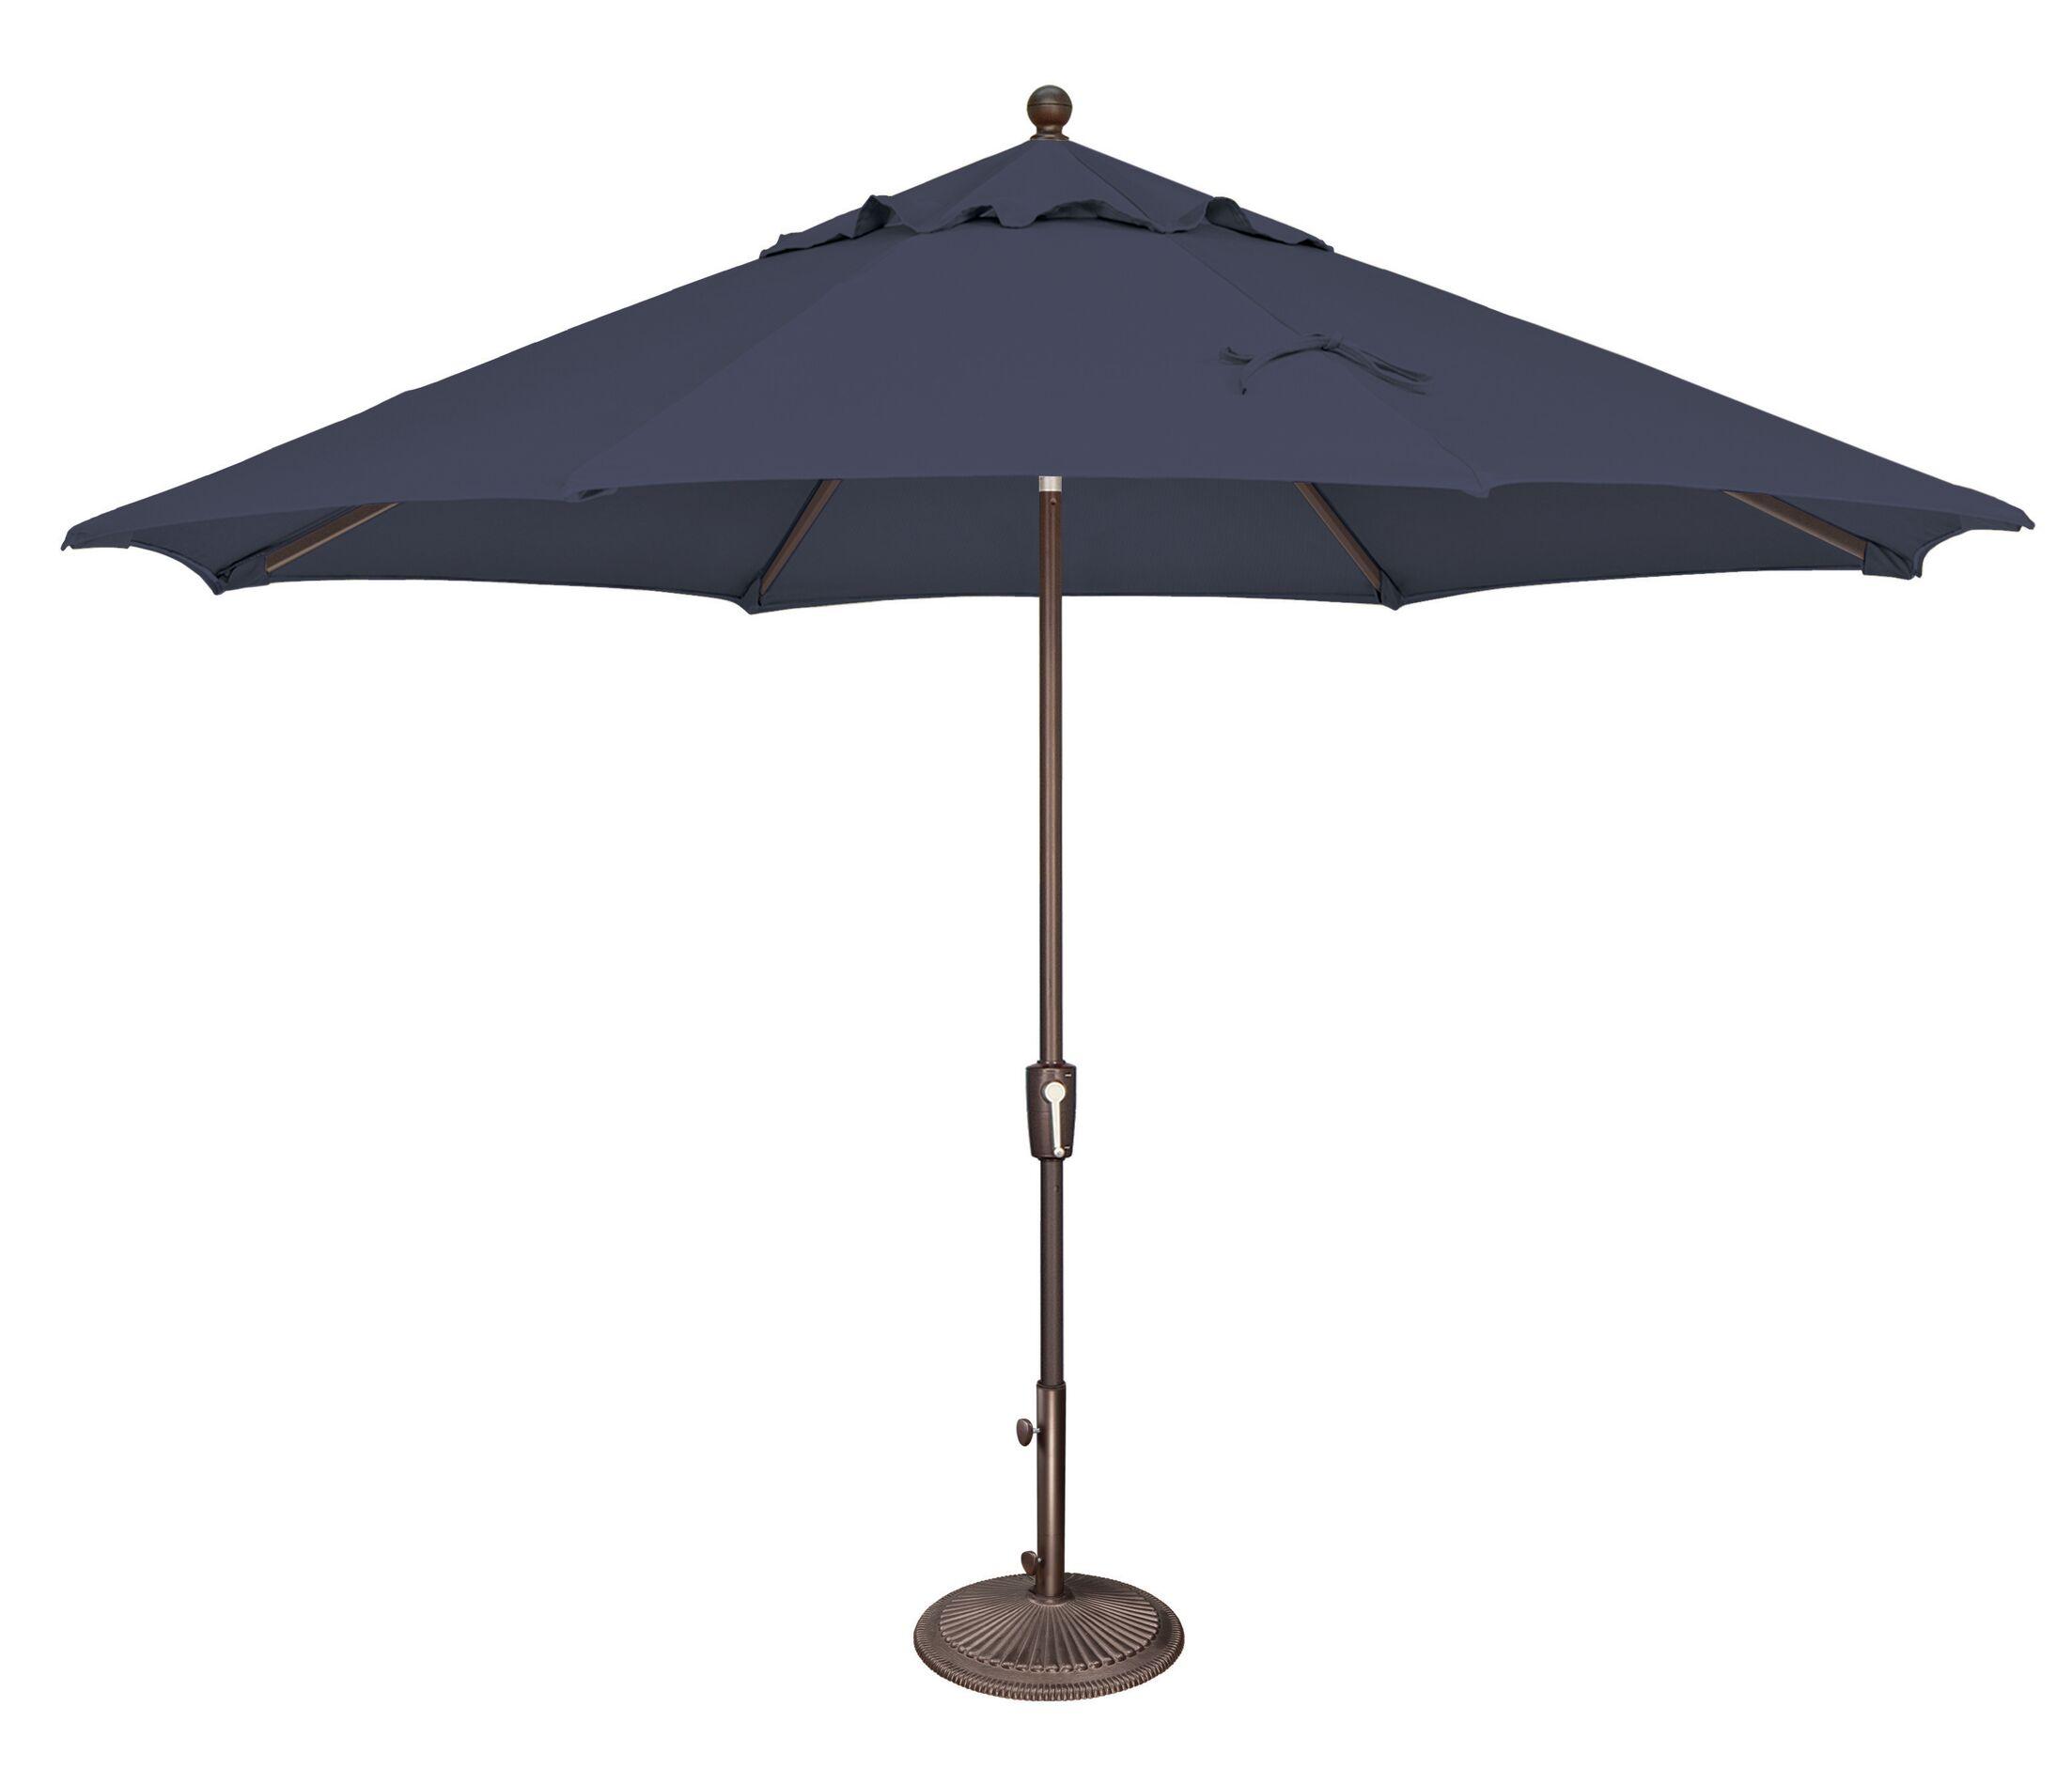 Catalina 11' Market Umbrella Fabric: Sunbrella / Navy